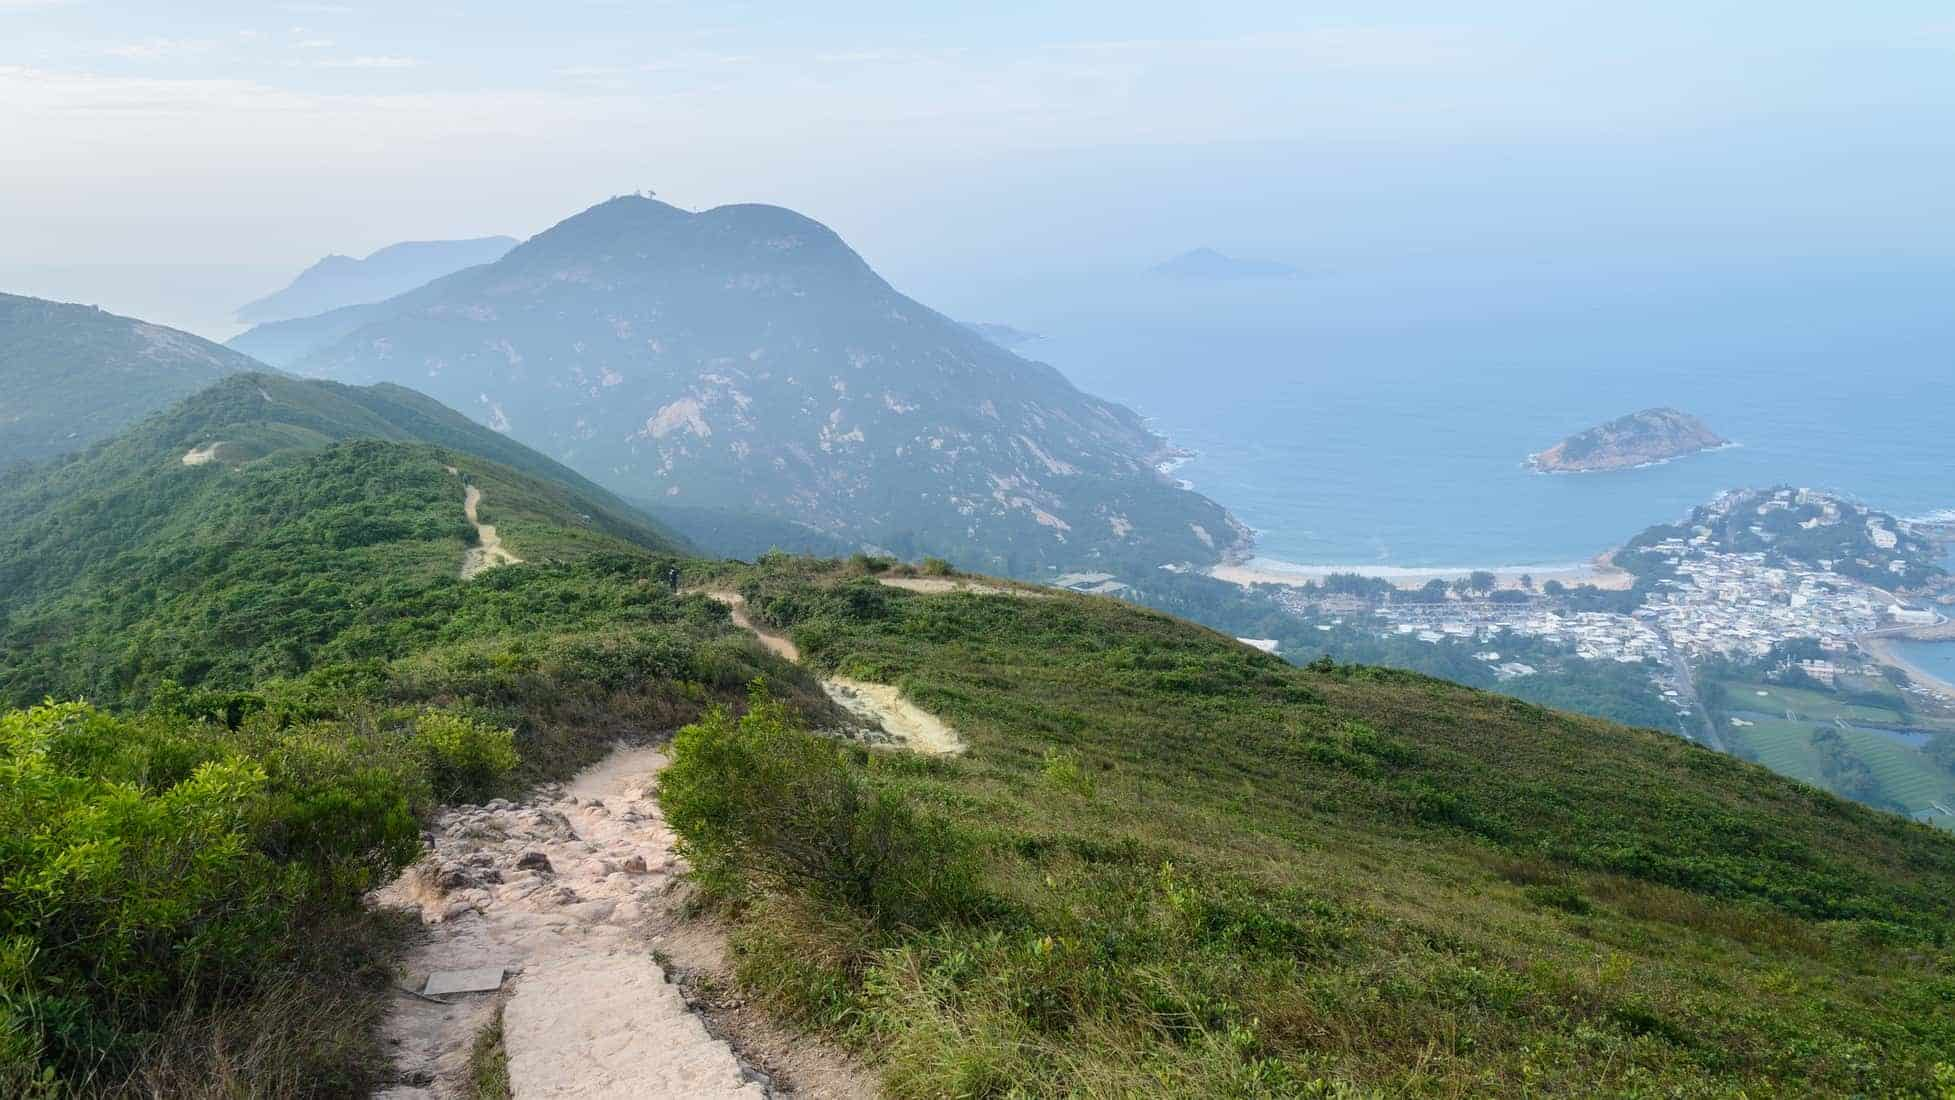 Hong Kong hiking trail scenery - Dragon's Back